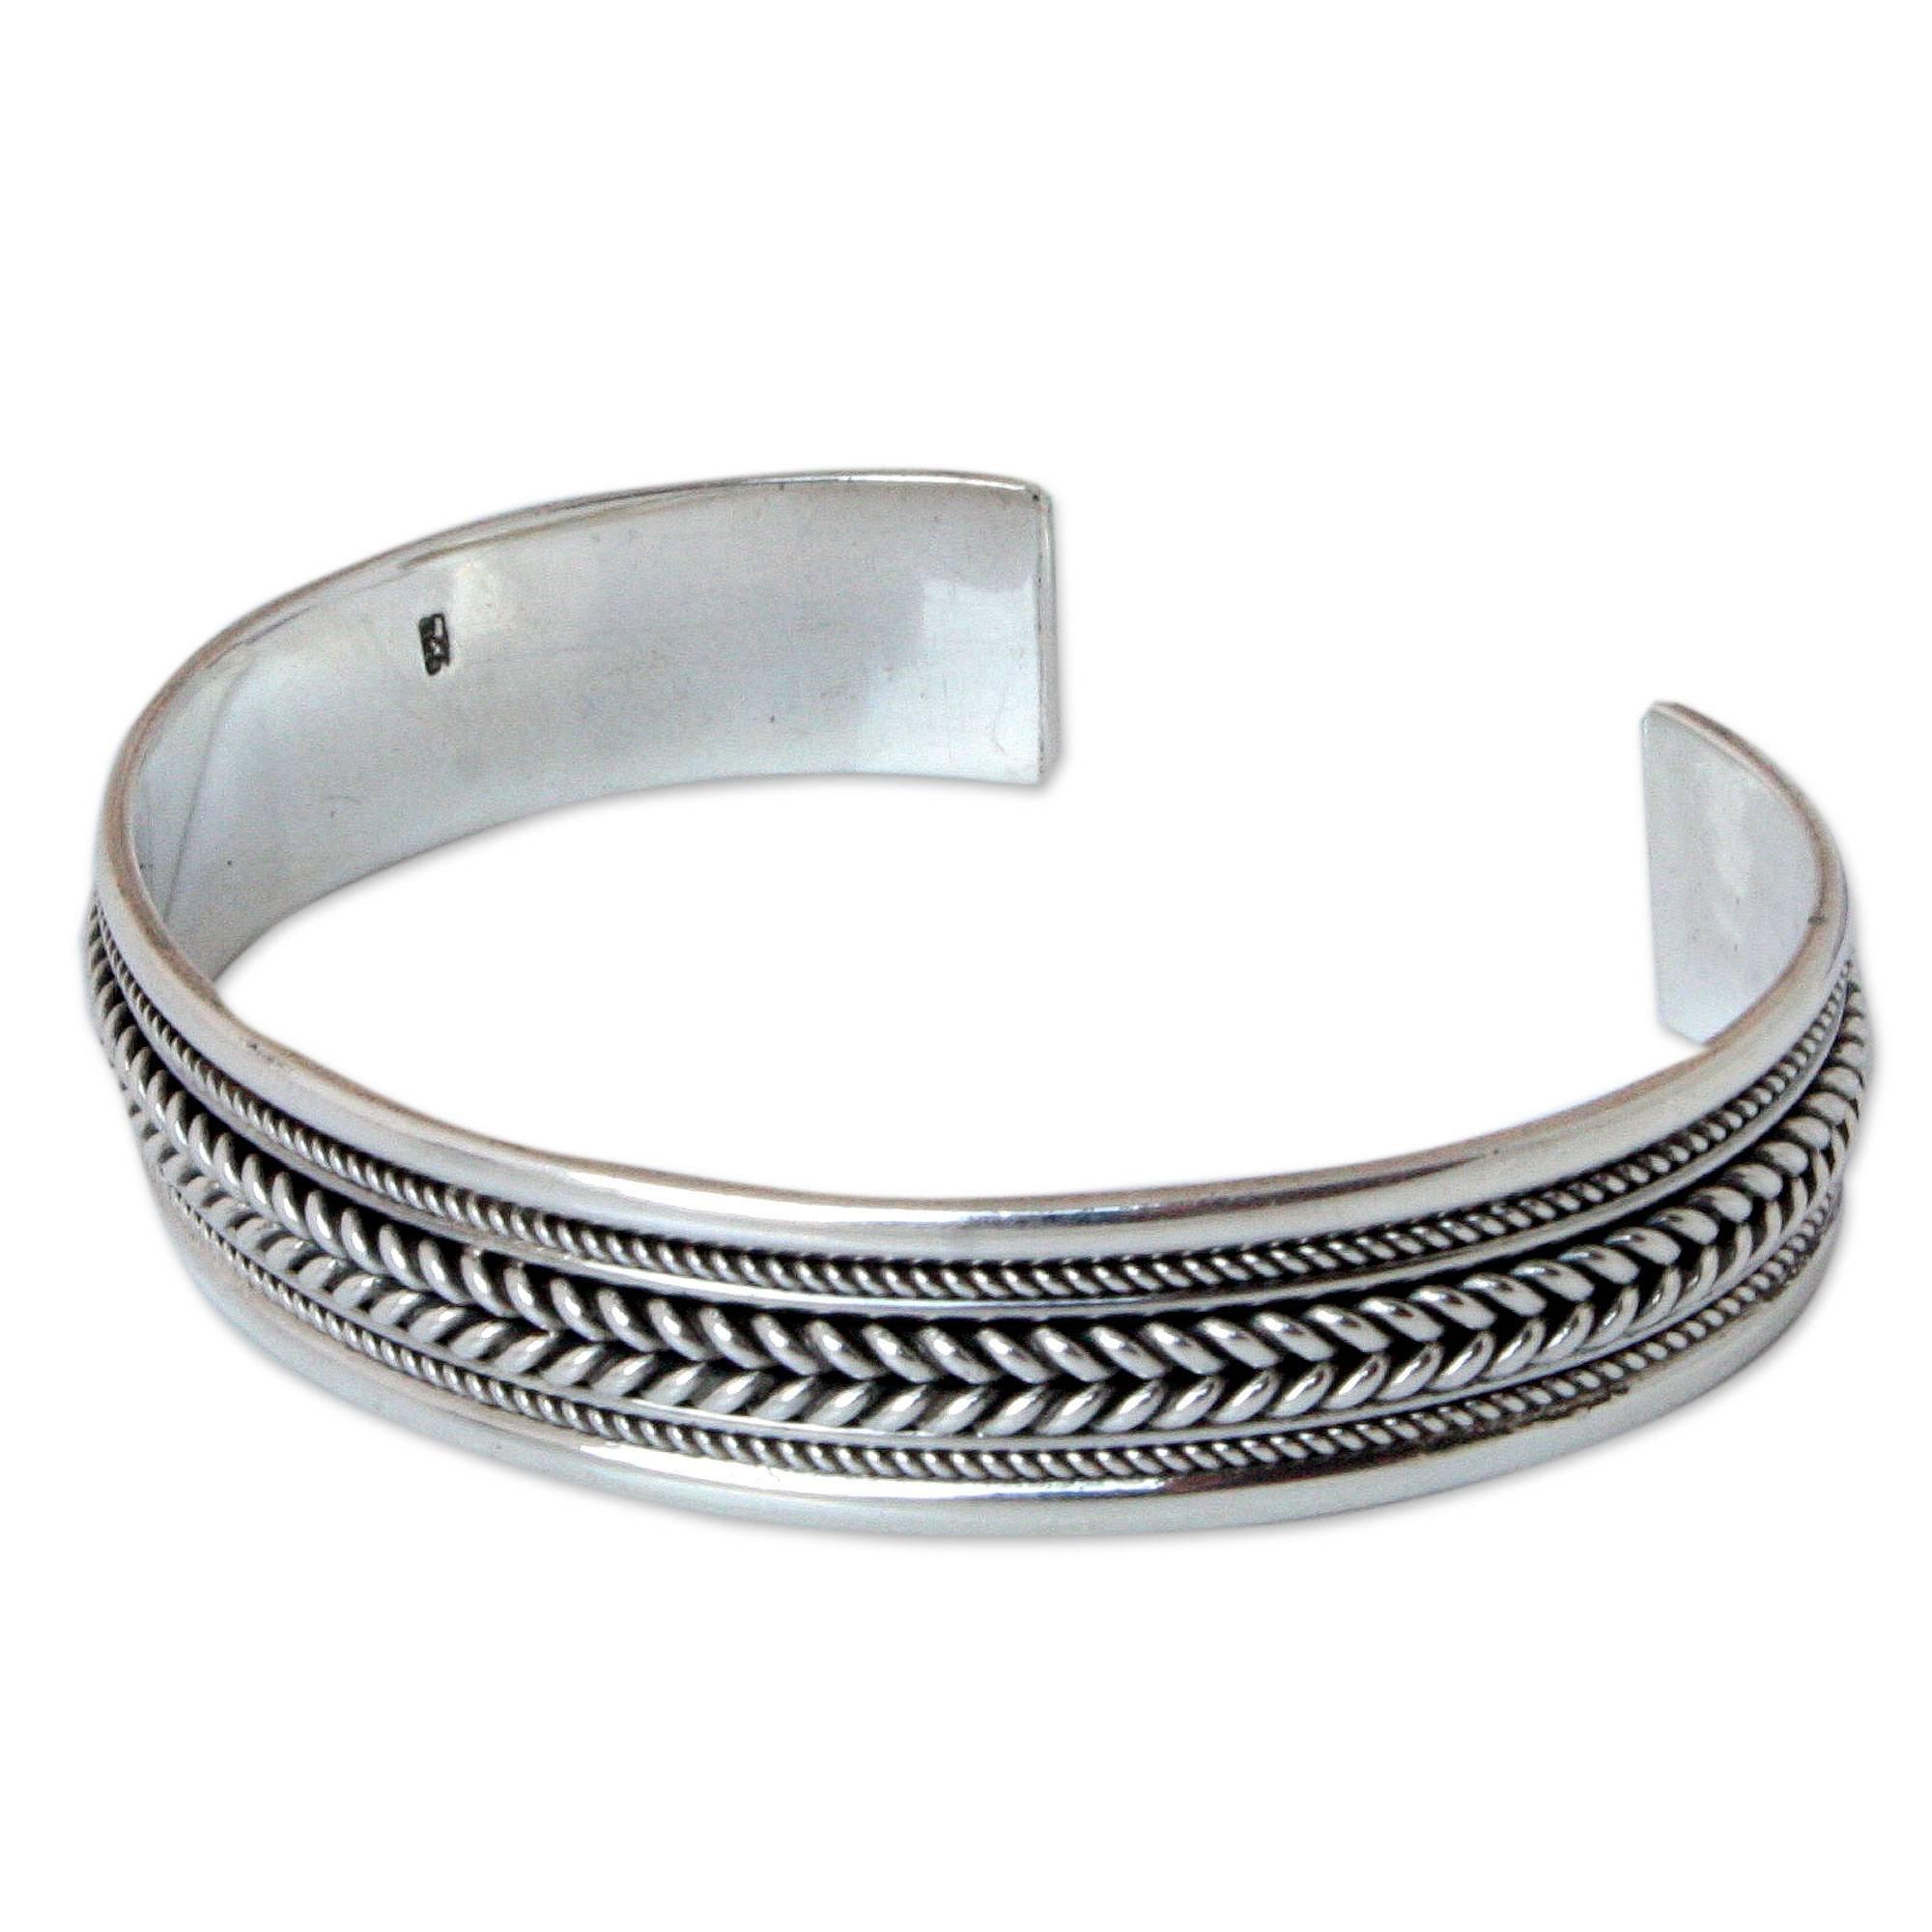 NOVICA .925 Sterling Silver Braid Cuff Bracelet, 6.0'', Lanna Illusions'